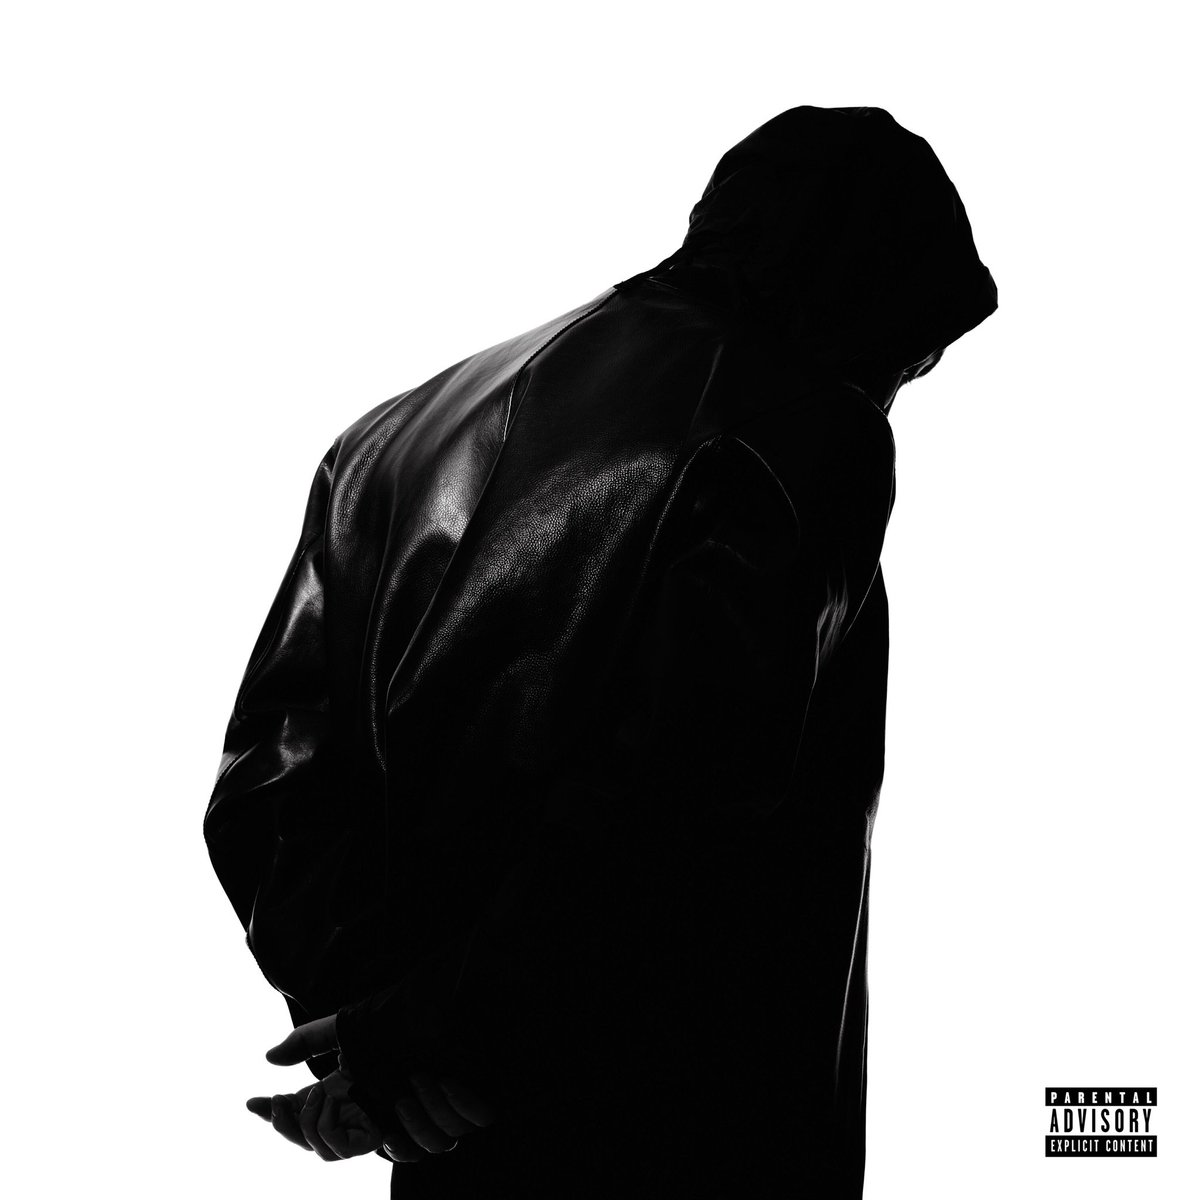 2. Be Somebody (feat. A$AP Rocky and Lil B) @asvpxrocky @lilbthebasedgod #32LEVELS https://t.co/cfwlk1EY4x